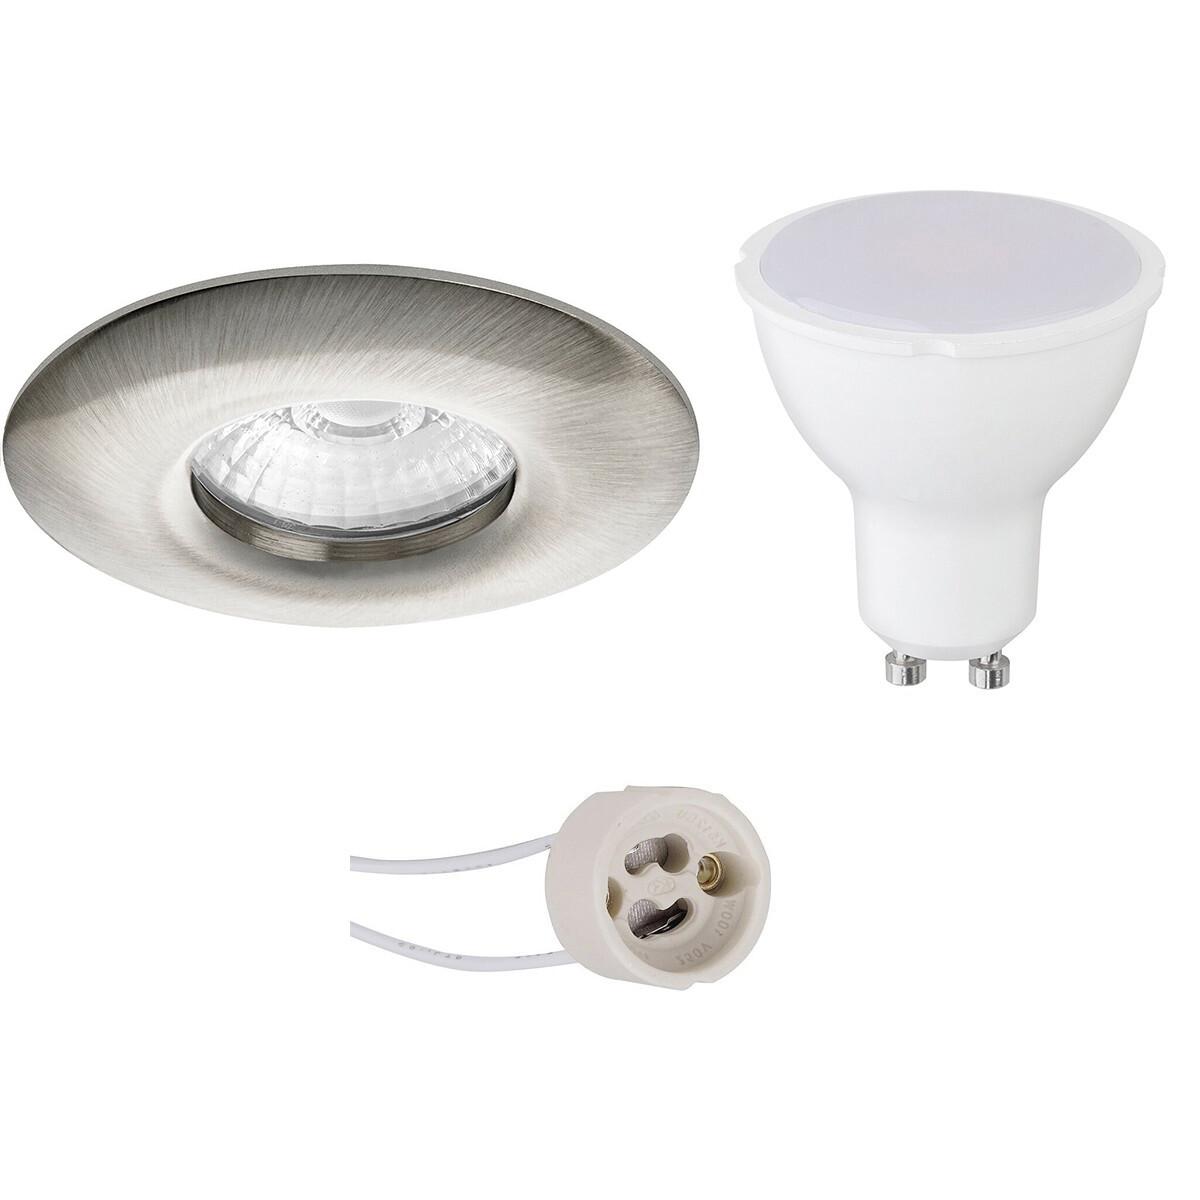 LED Spot Set - Pragmi Luno Pro - Waterdicht IP65 - GU10 Fitting - Inbouw Rond - Mat Nikkel - 6W - Na